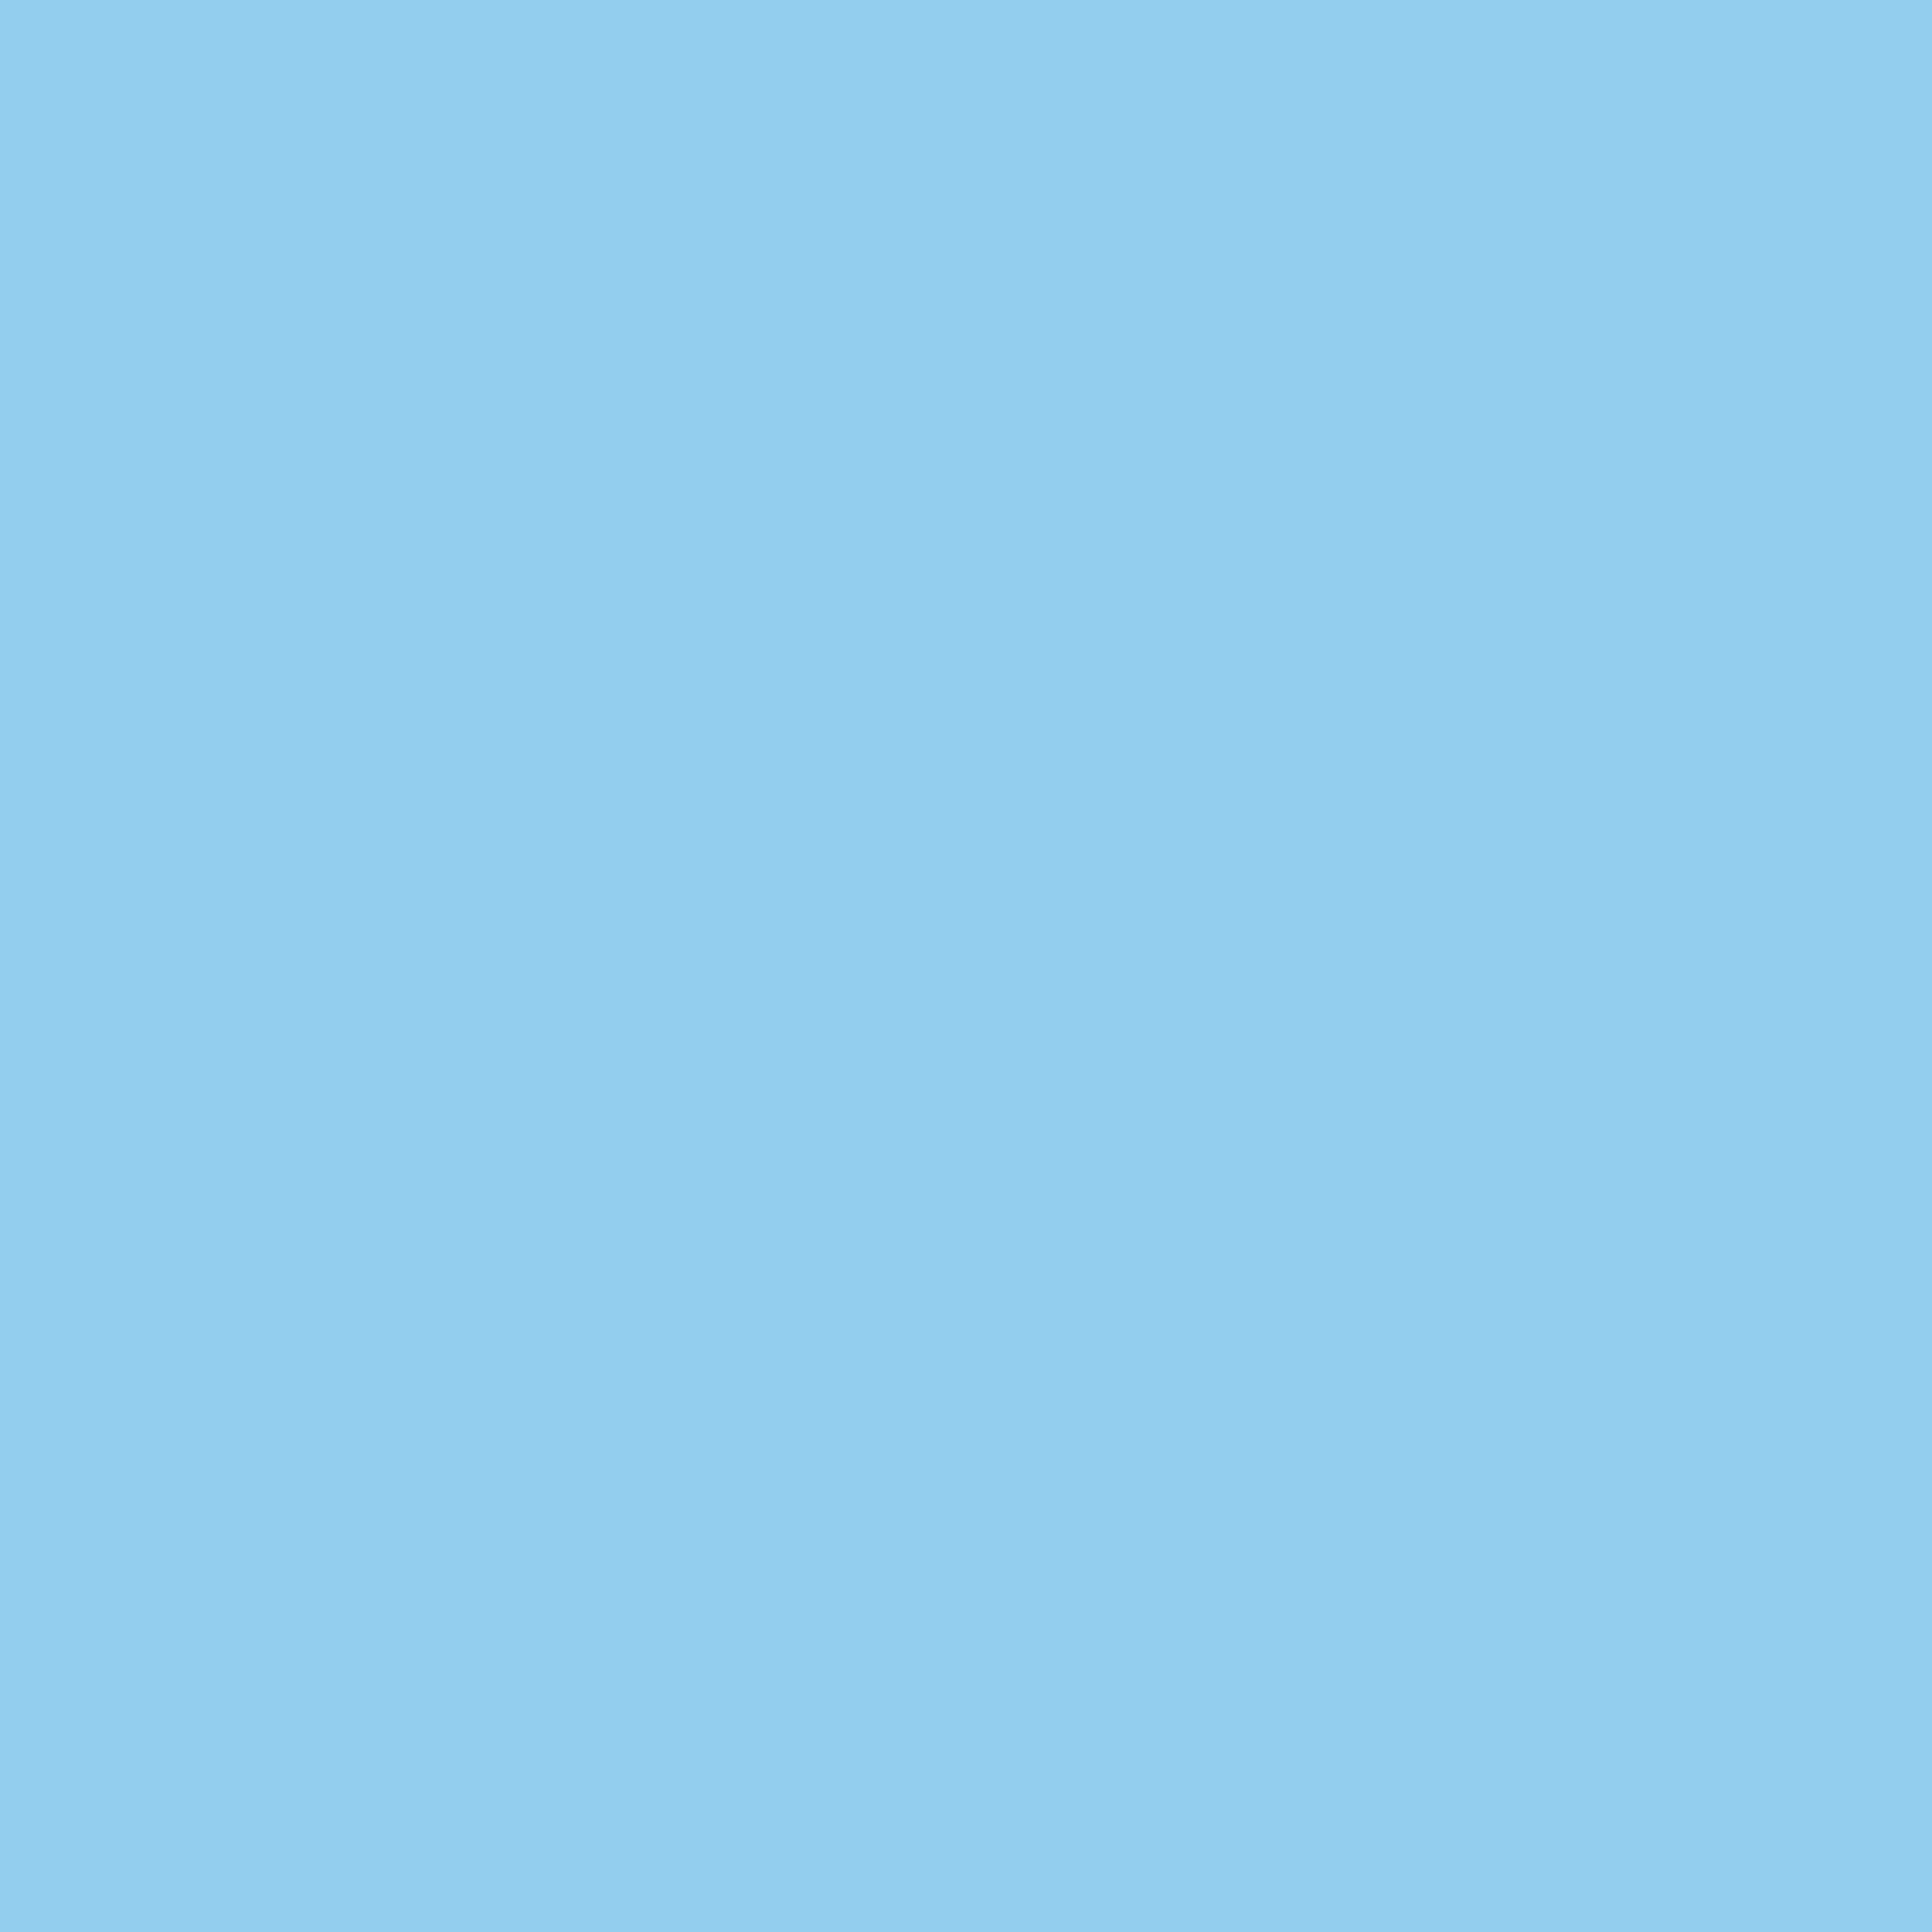 2732x2732 Light Cornflower Blue Solid Color Background